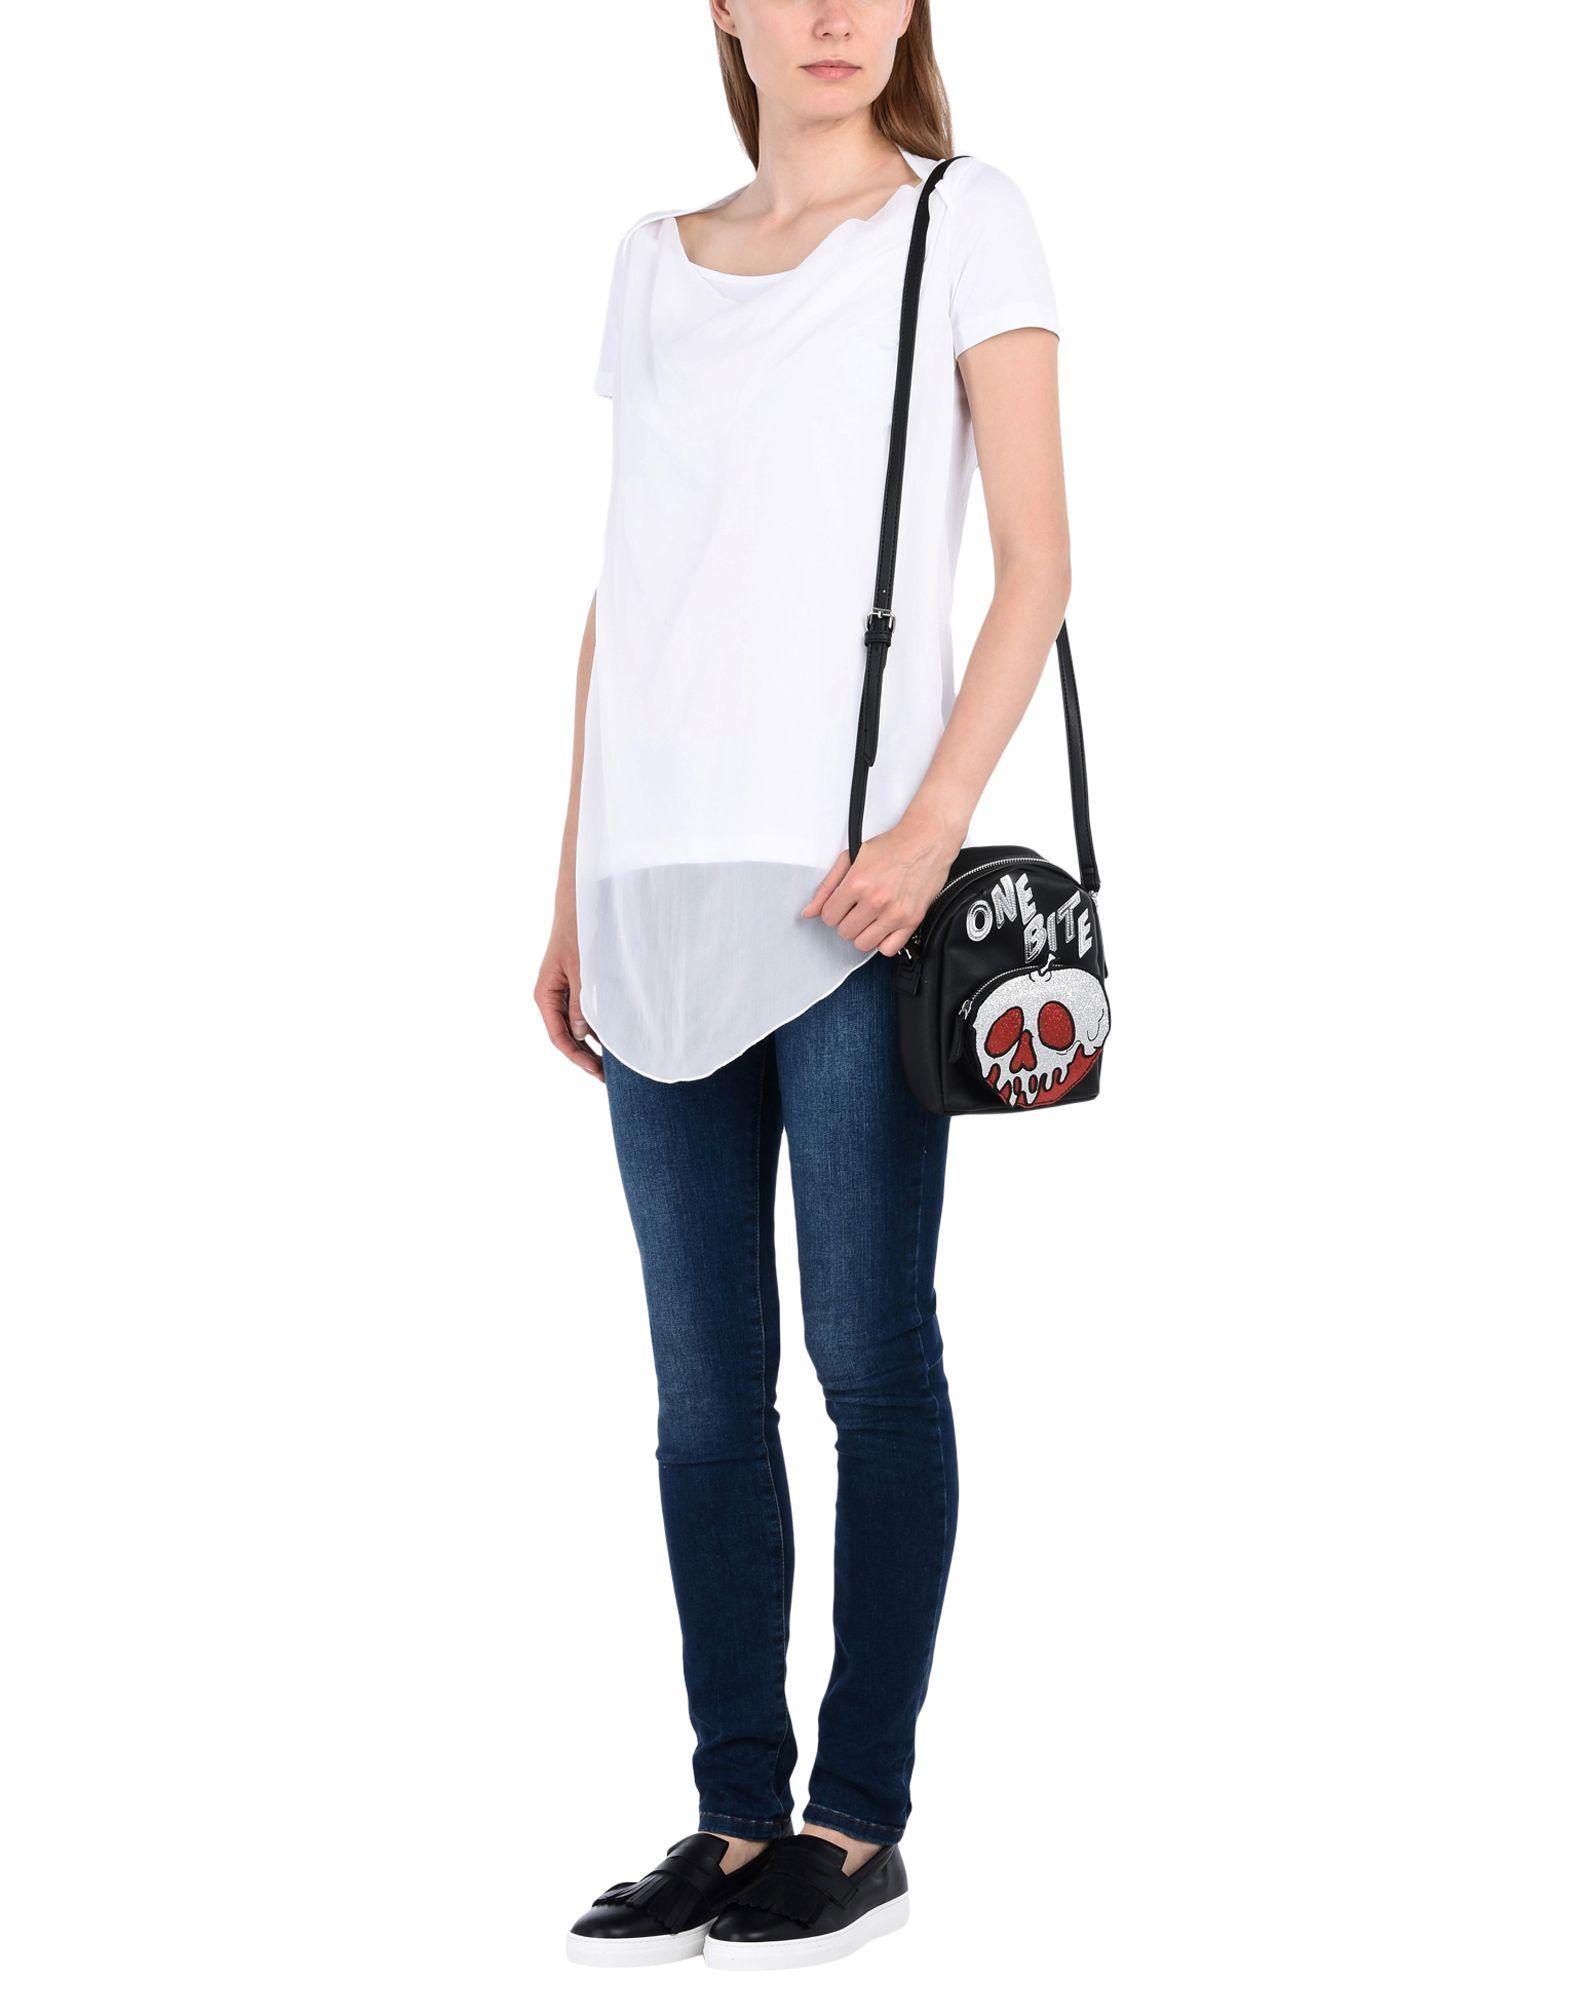 Danielle Nicole Cross-body Bag in Black